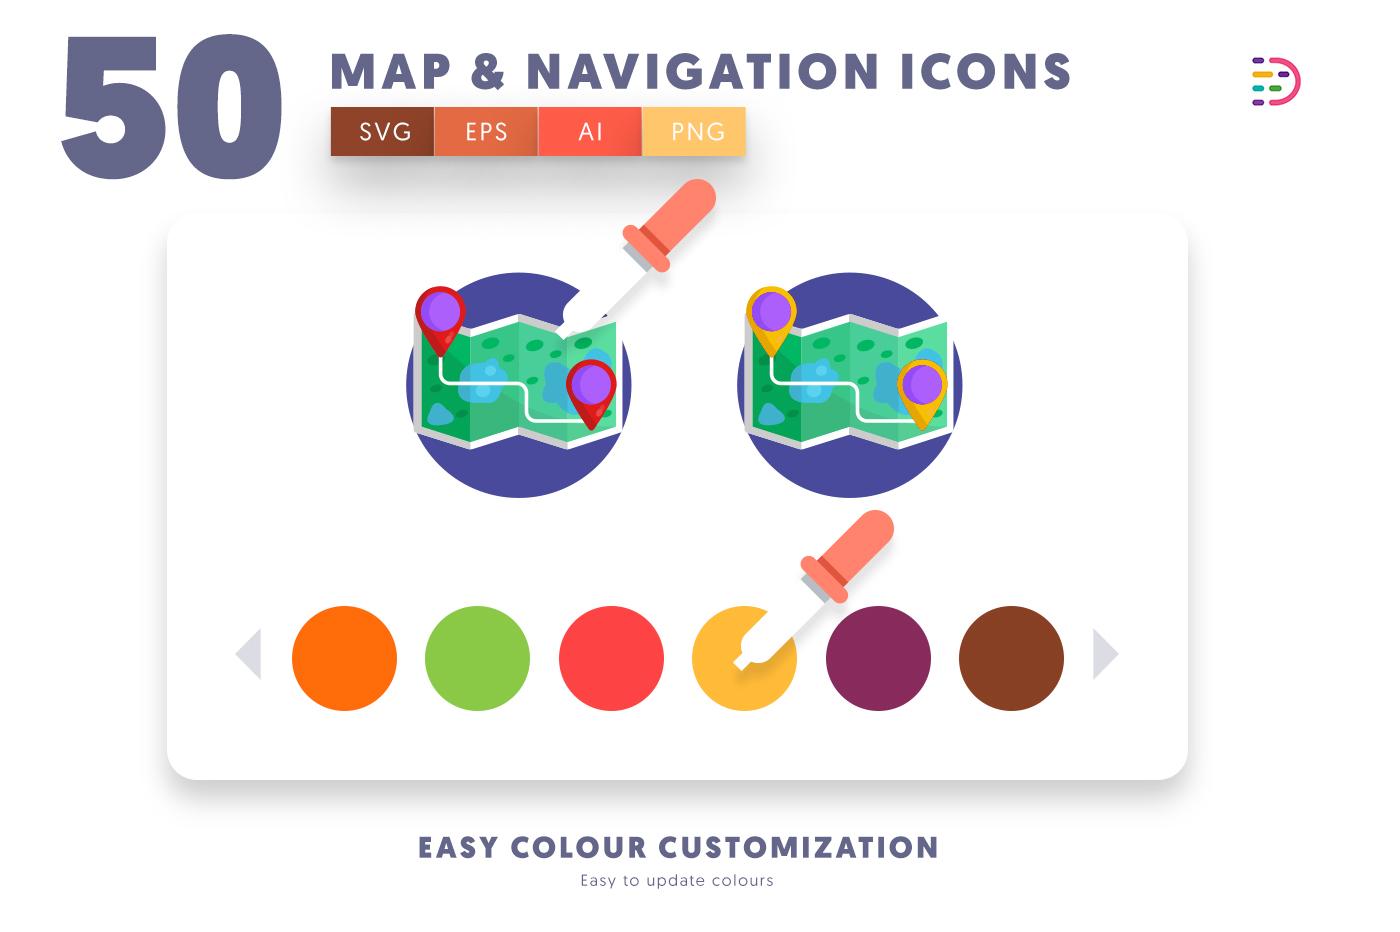 EPS, SVG, PNG full vector 50 Map & Navigation Icons